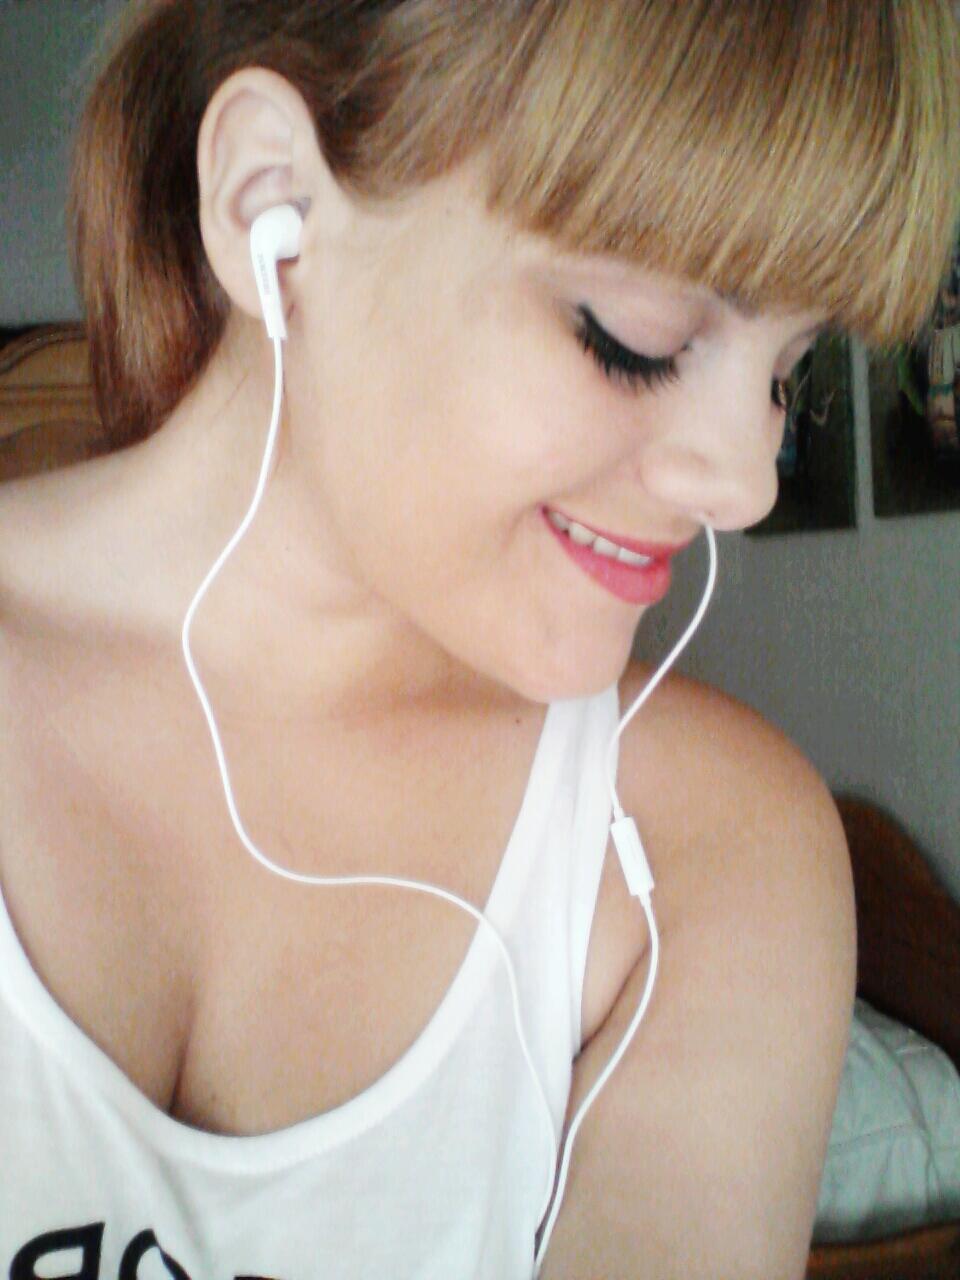 Claudia-91's Profile Picture